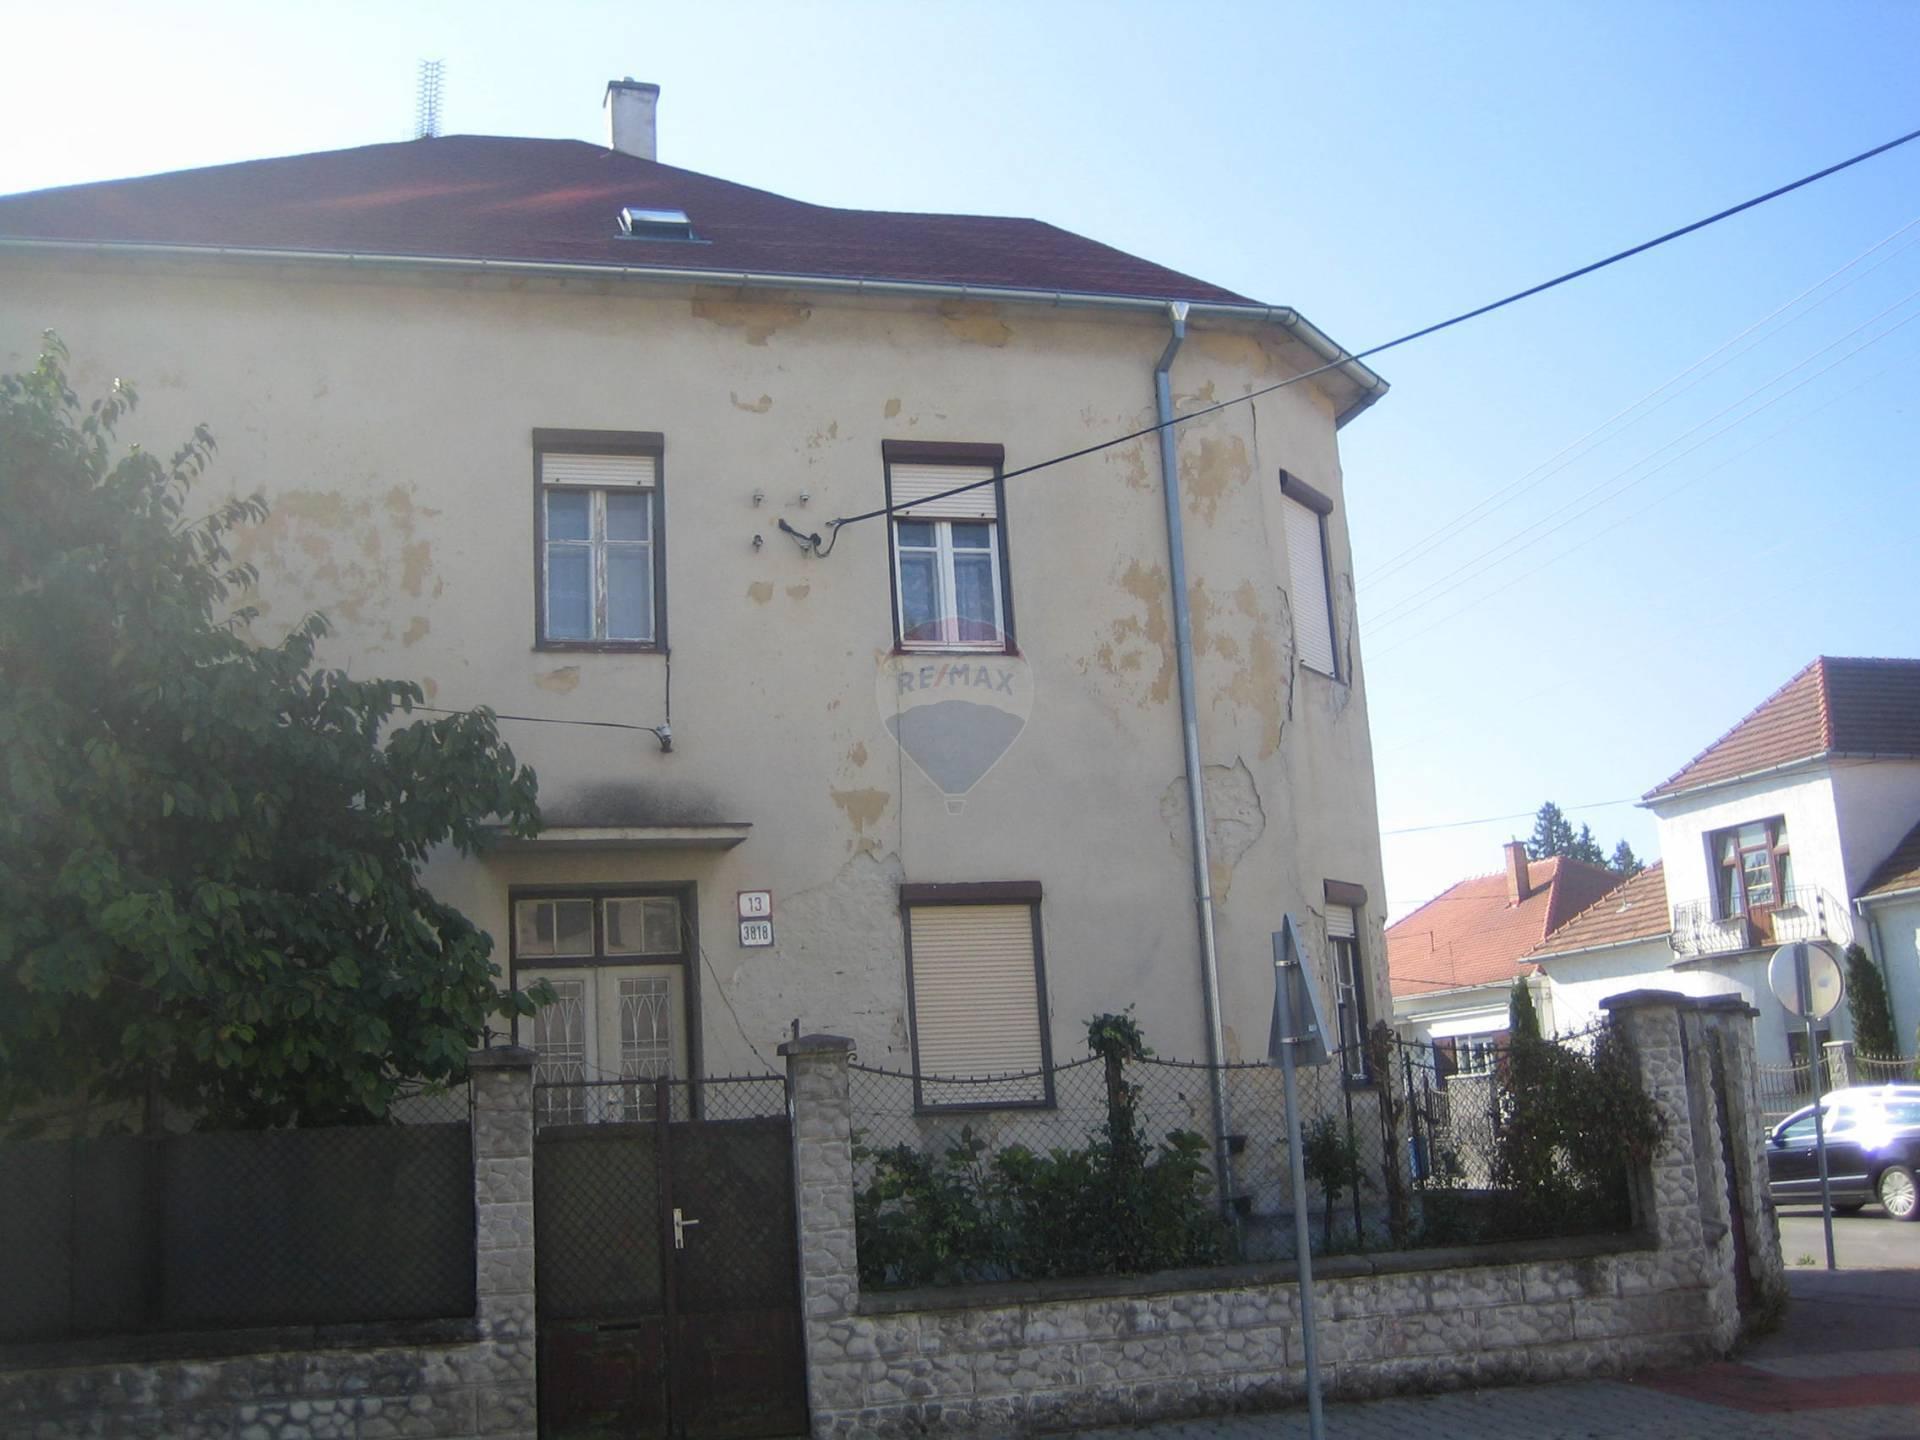 Predaj domu 240 m2, Trnava - pohľad z ulice